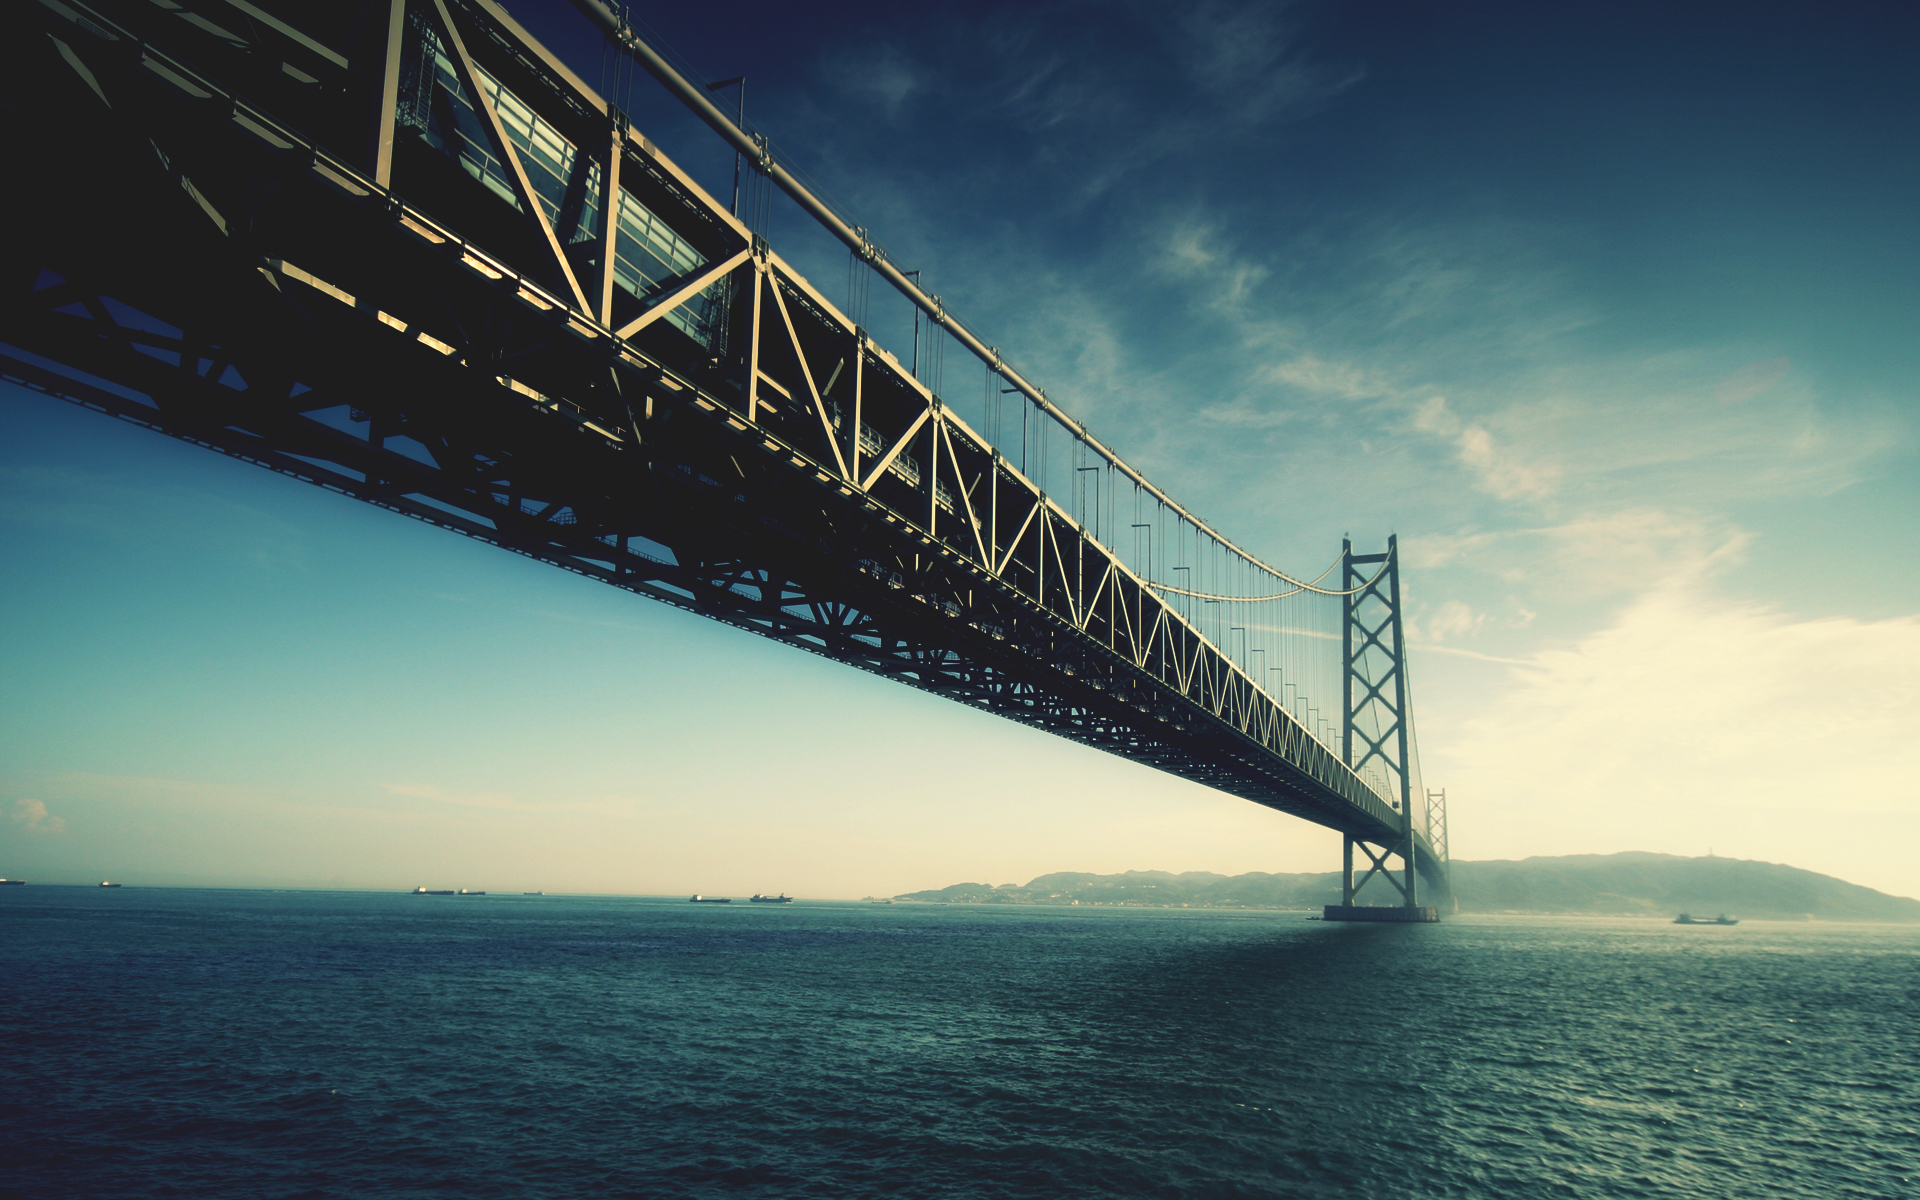 Free Under Bridge Wallpaper